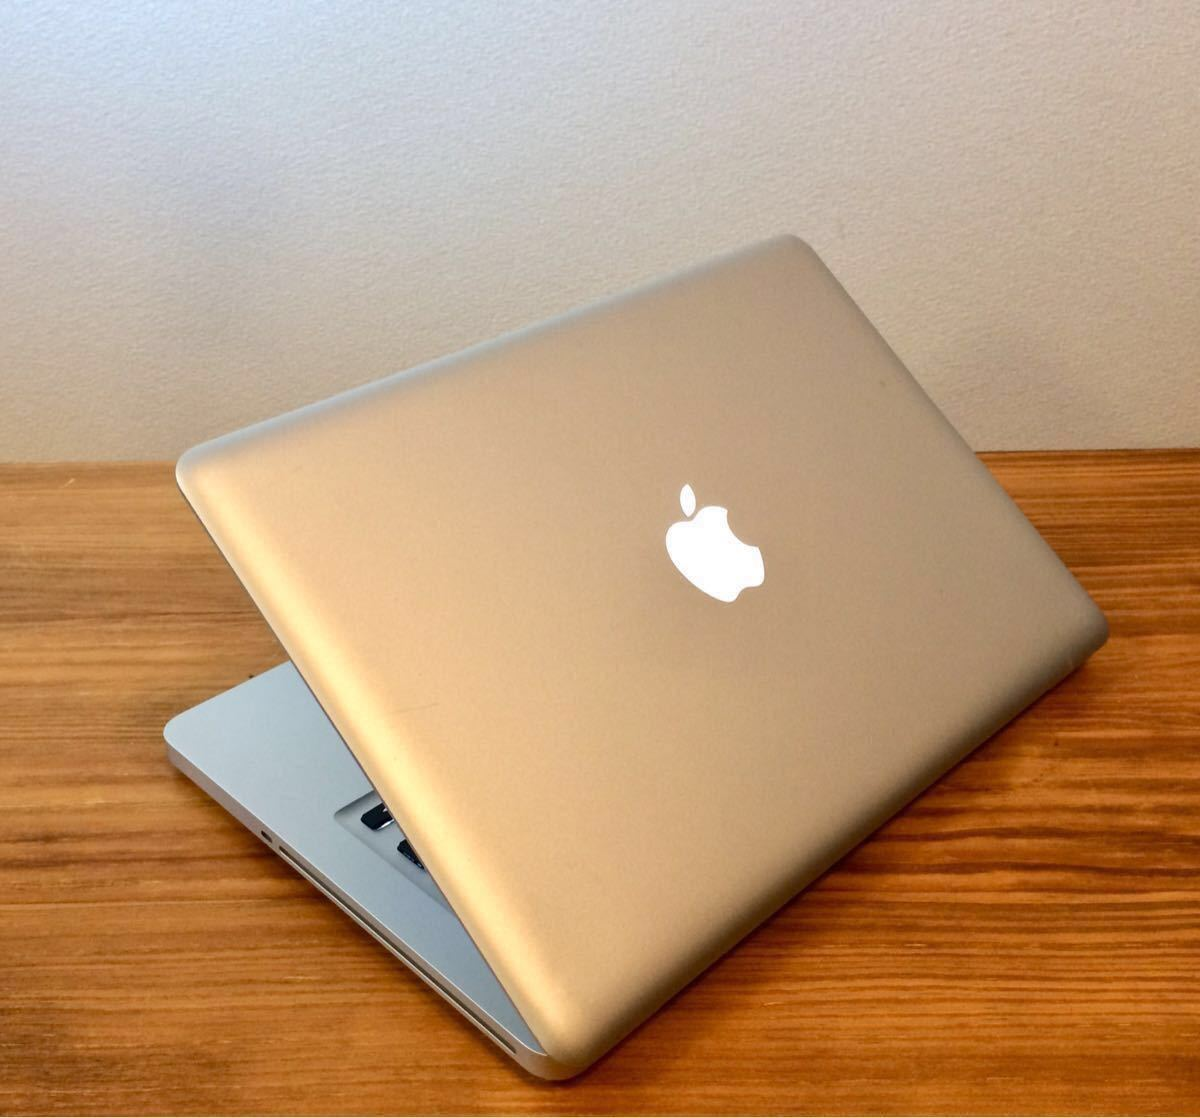 最上位最強!新品超大容量SSD960GB&新品超速メモリー16GB&大容量純正バッテリー MacBookPro MD102J/A i7 2.9GHz(3.6GHz) 最新OS対応/Mojave_画像4